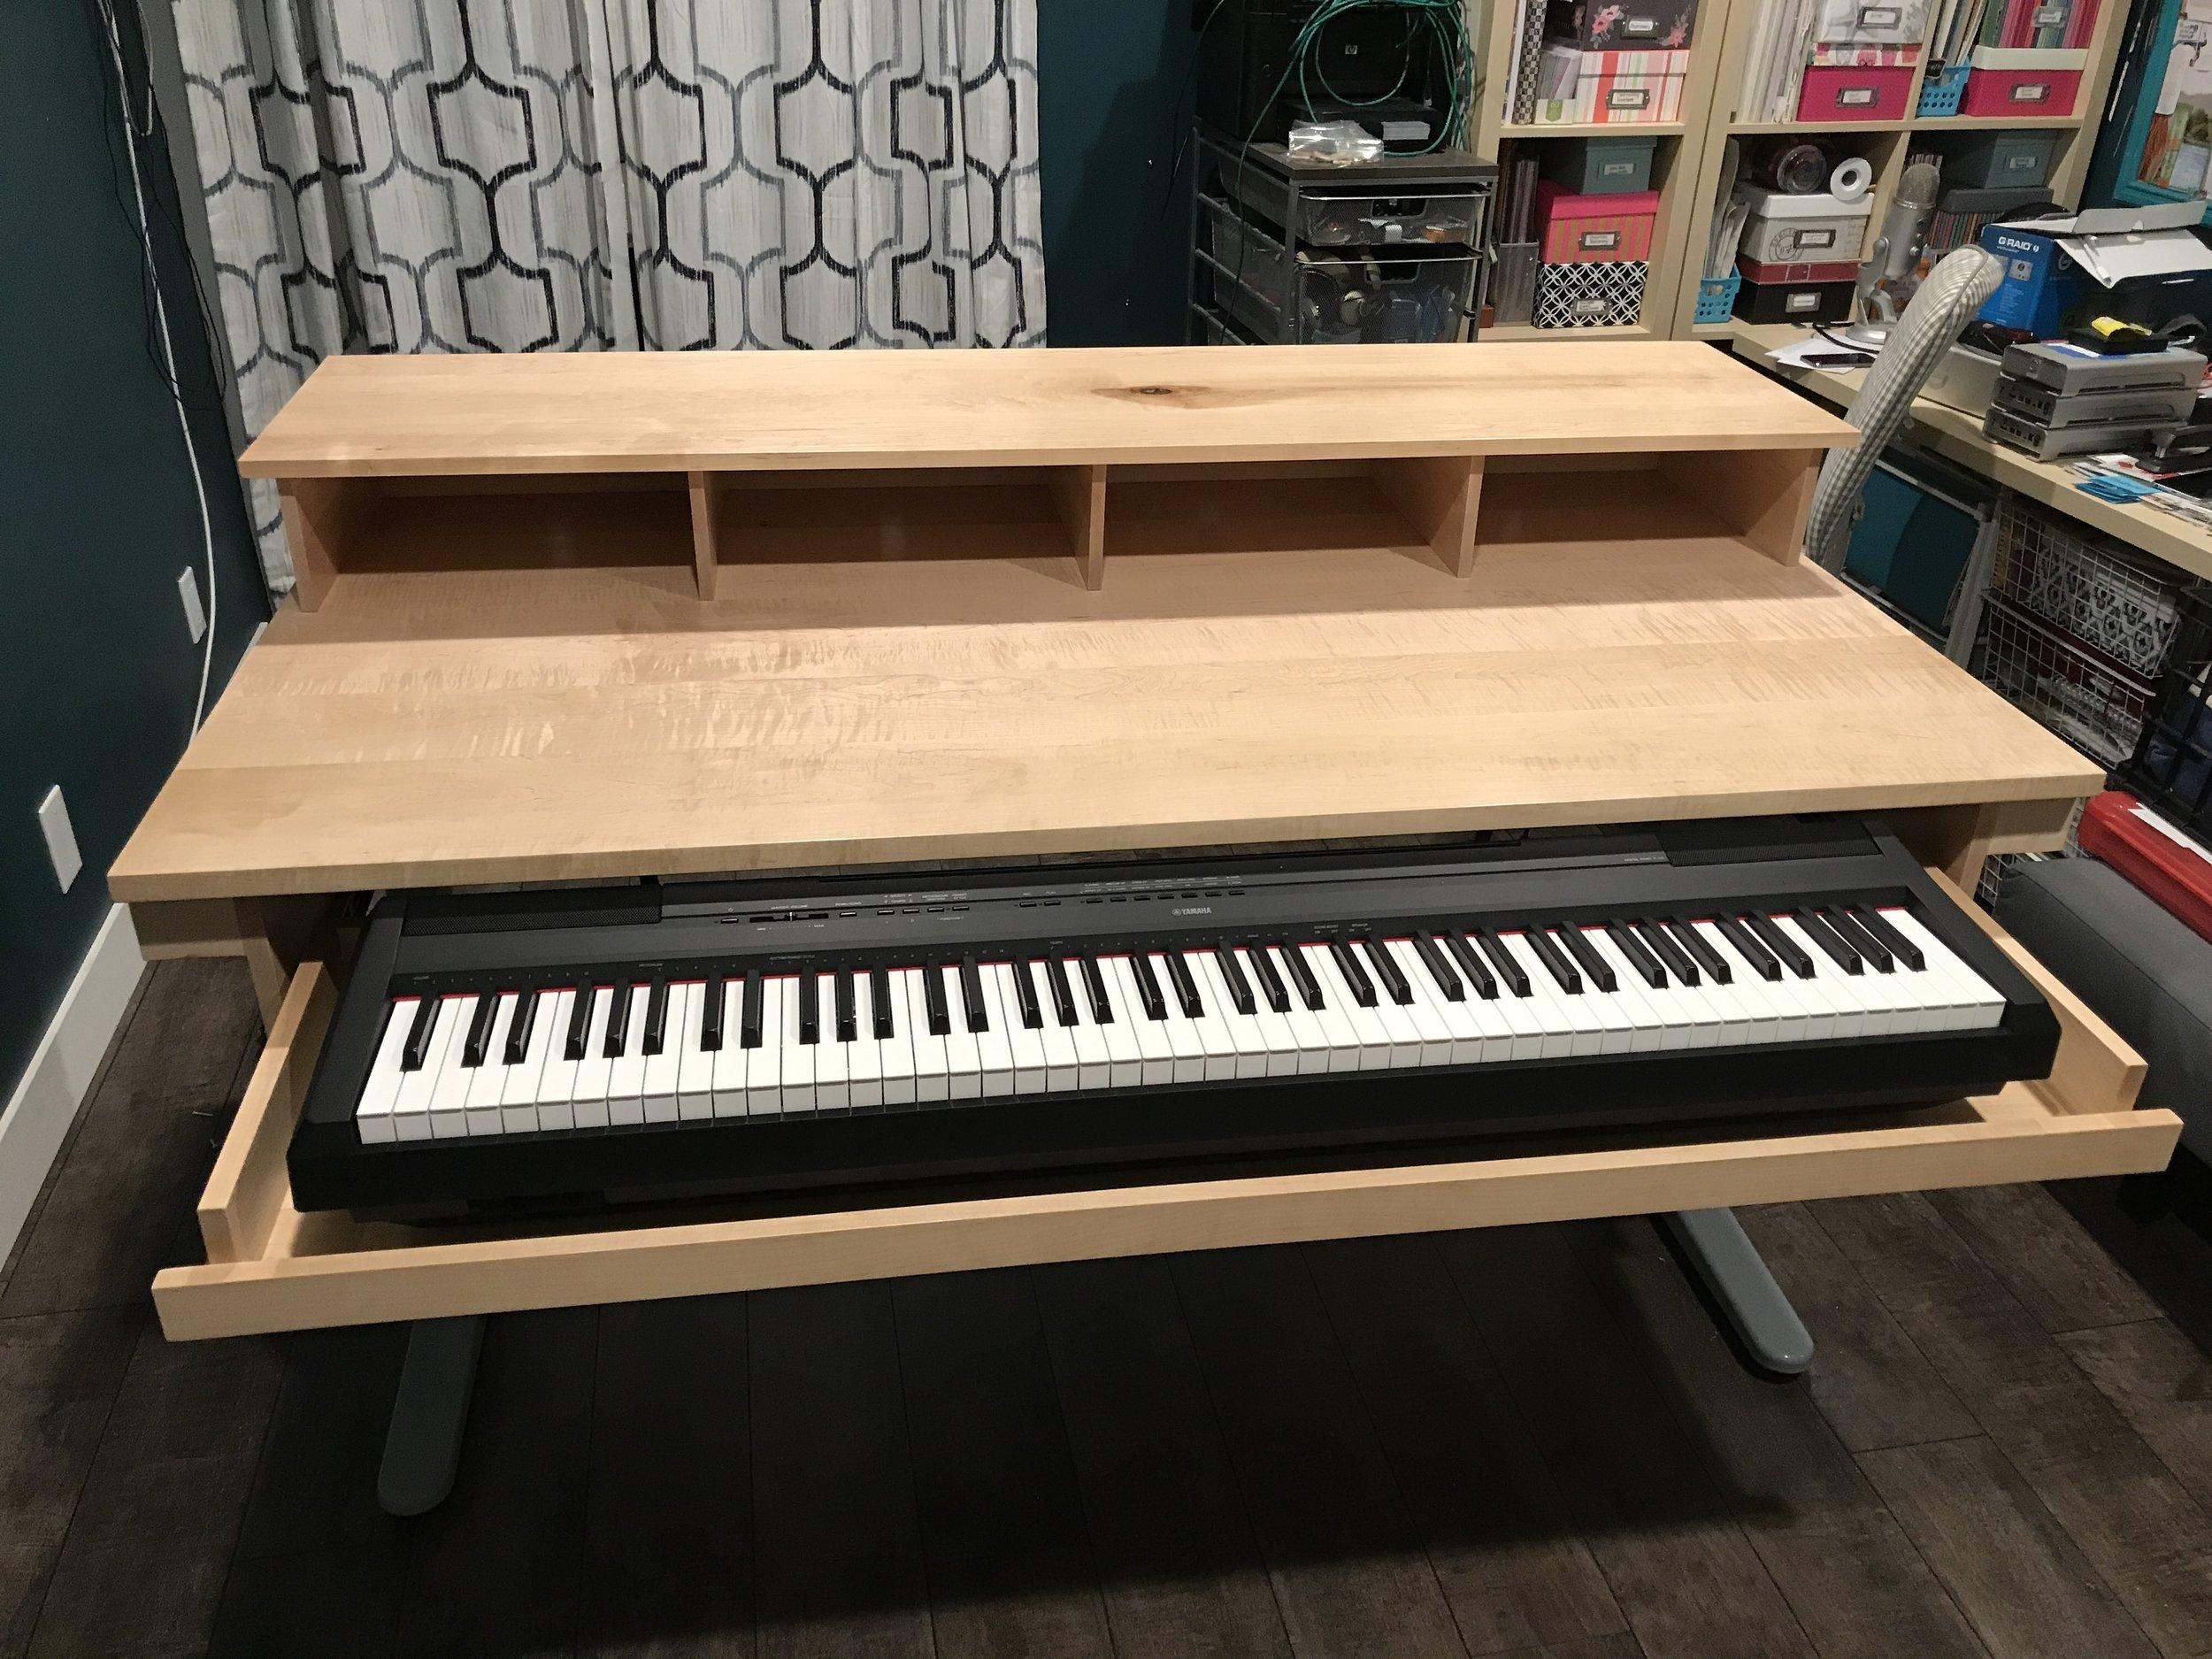 Piano Studio Desk Henneydesigns